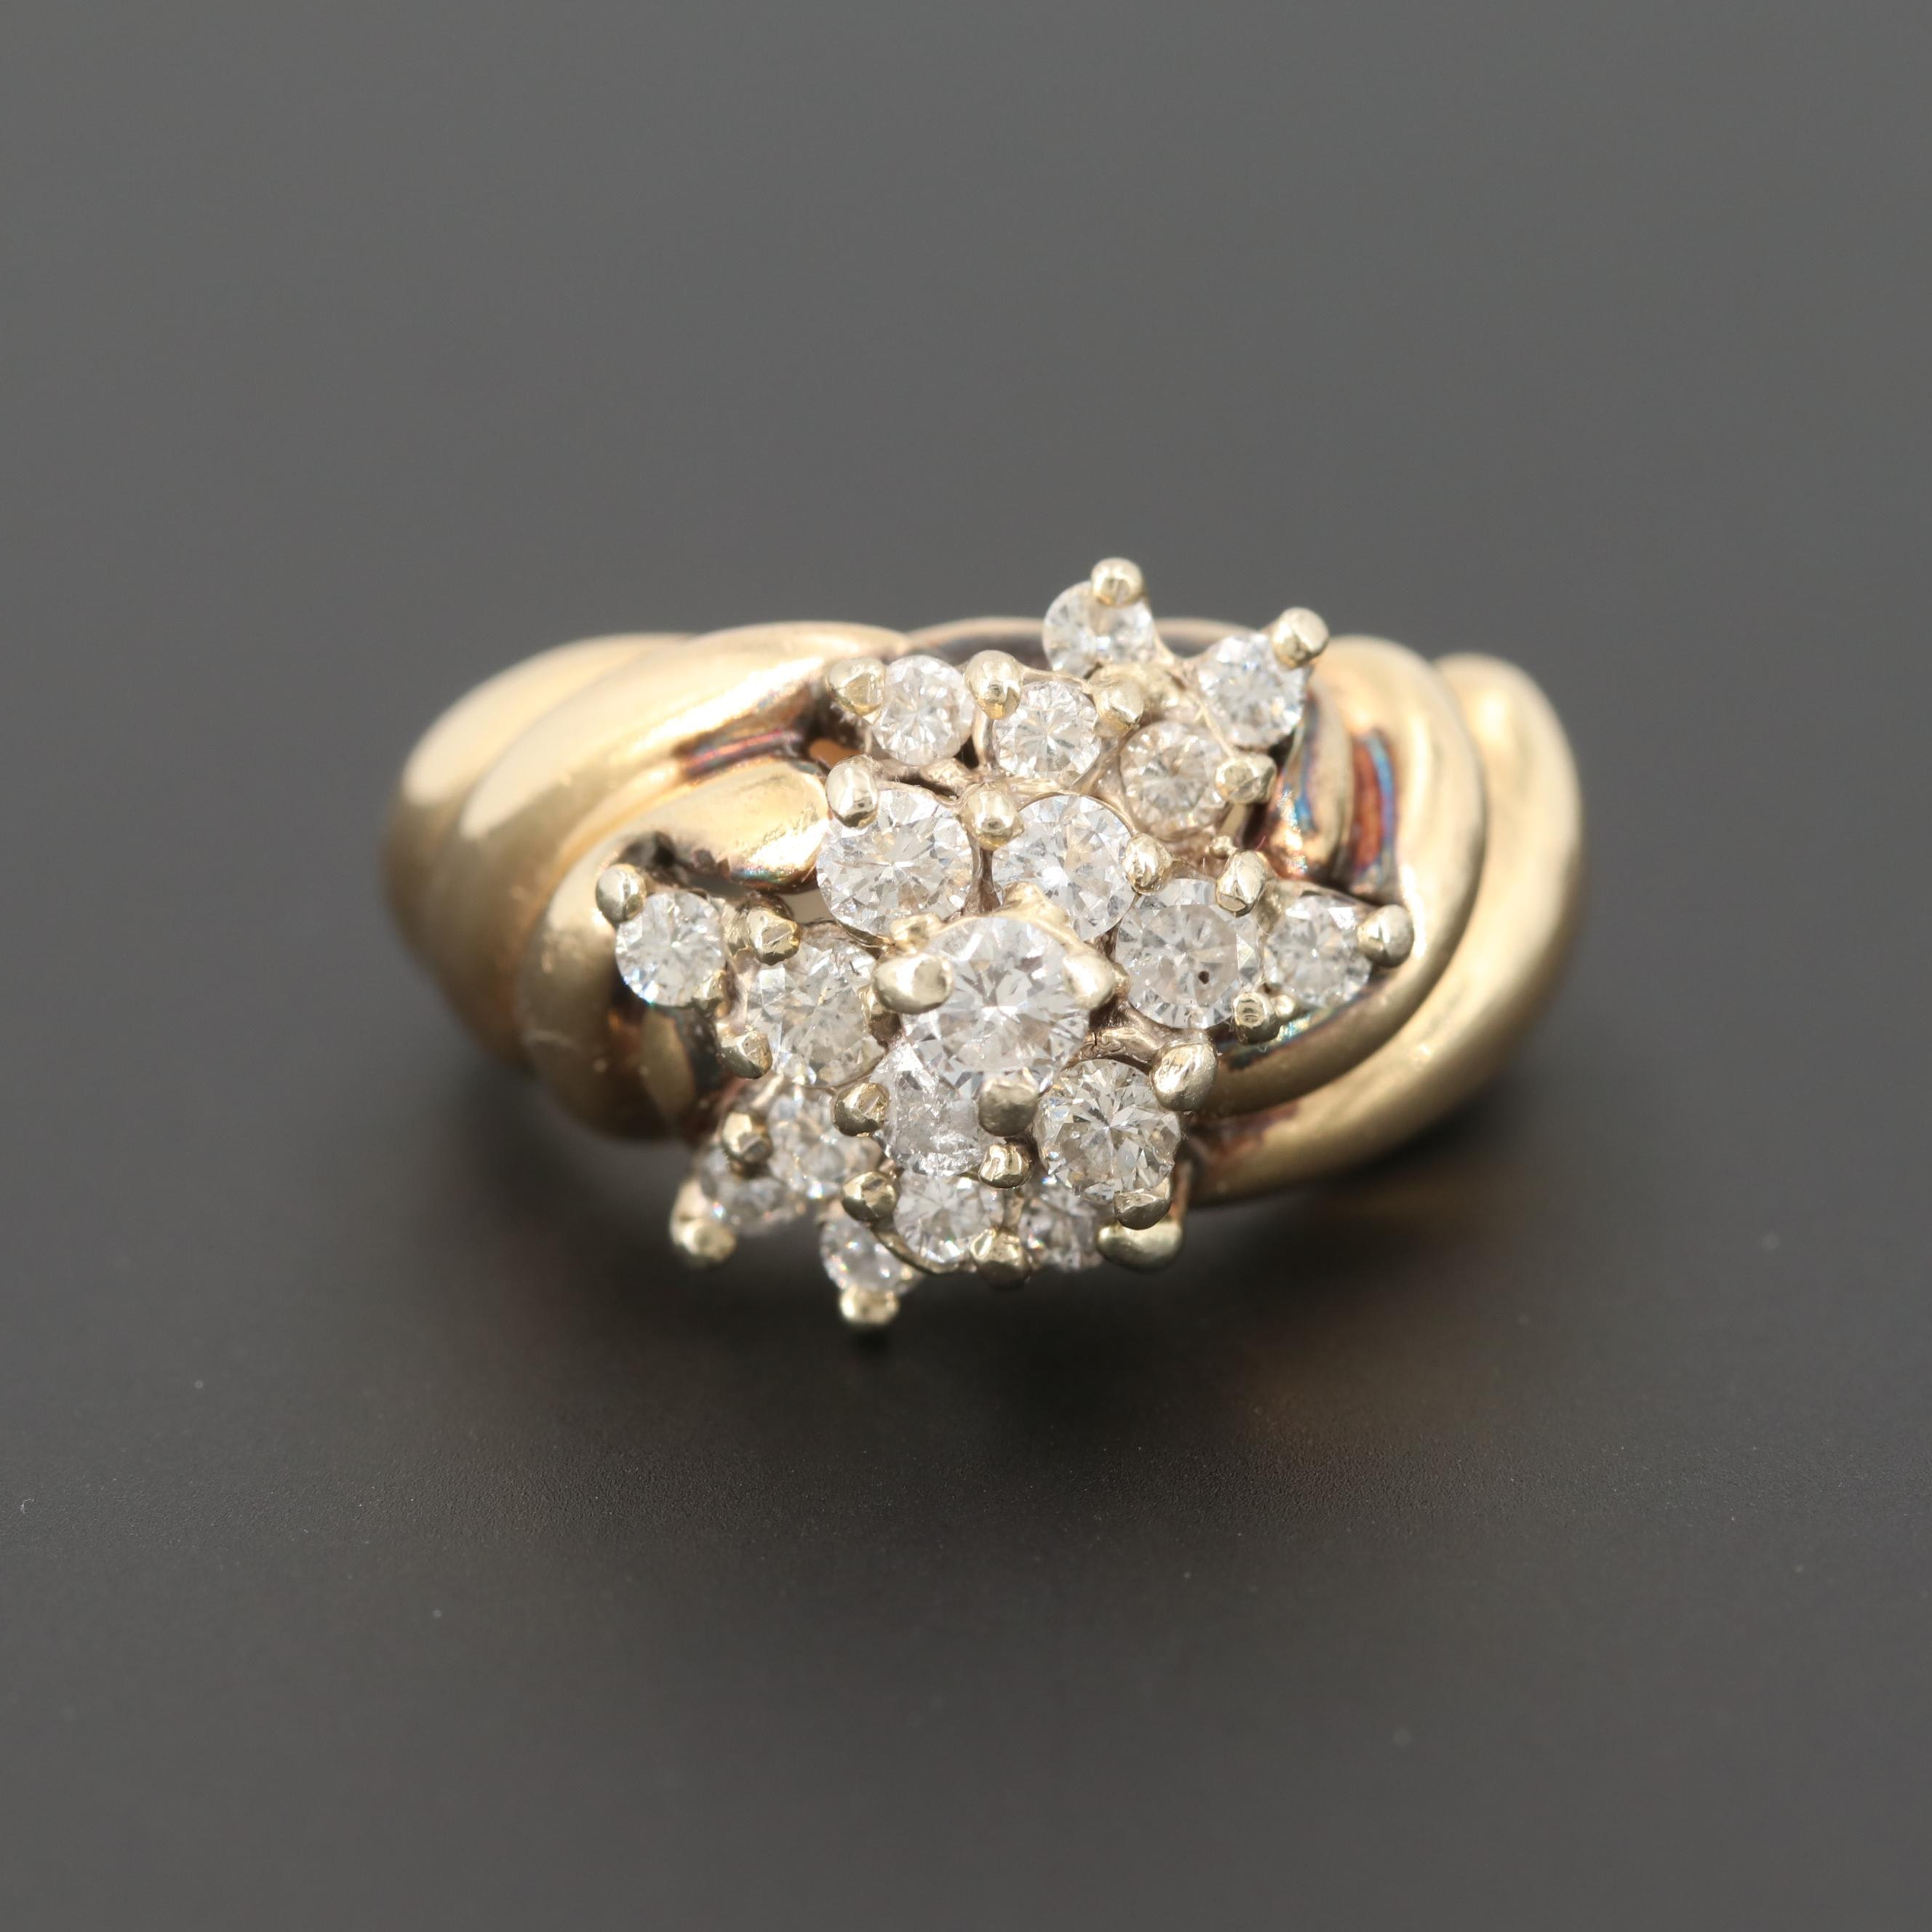 14K Yellow Gold 1.23 CTW Diamond Ring